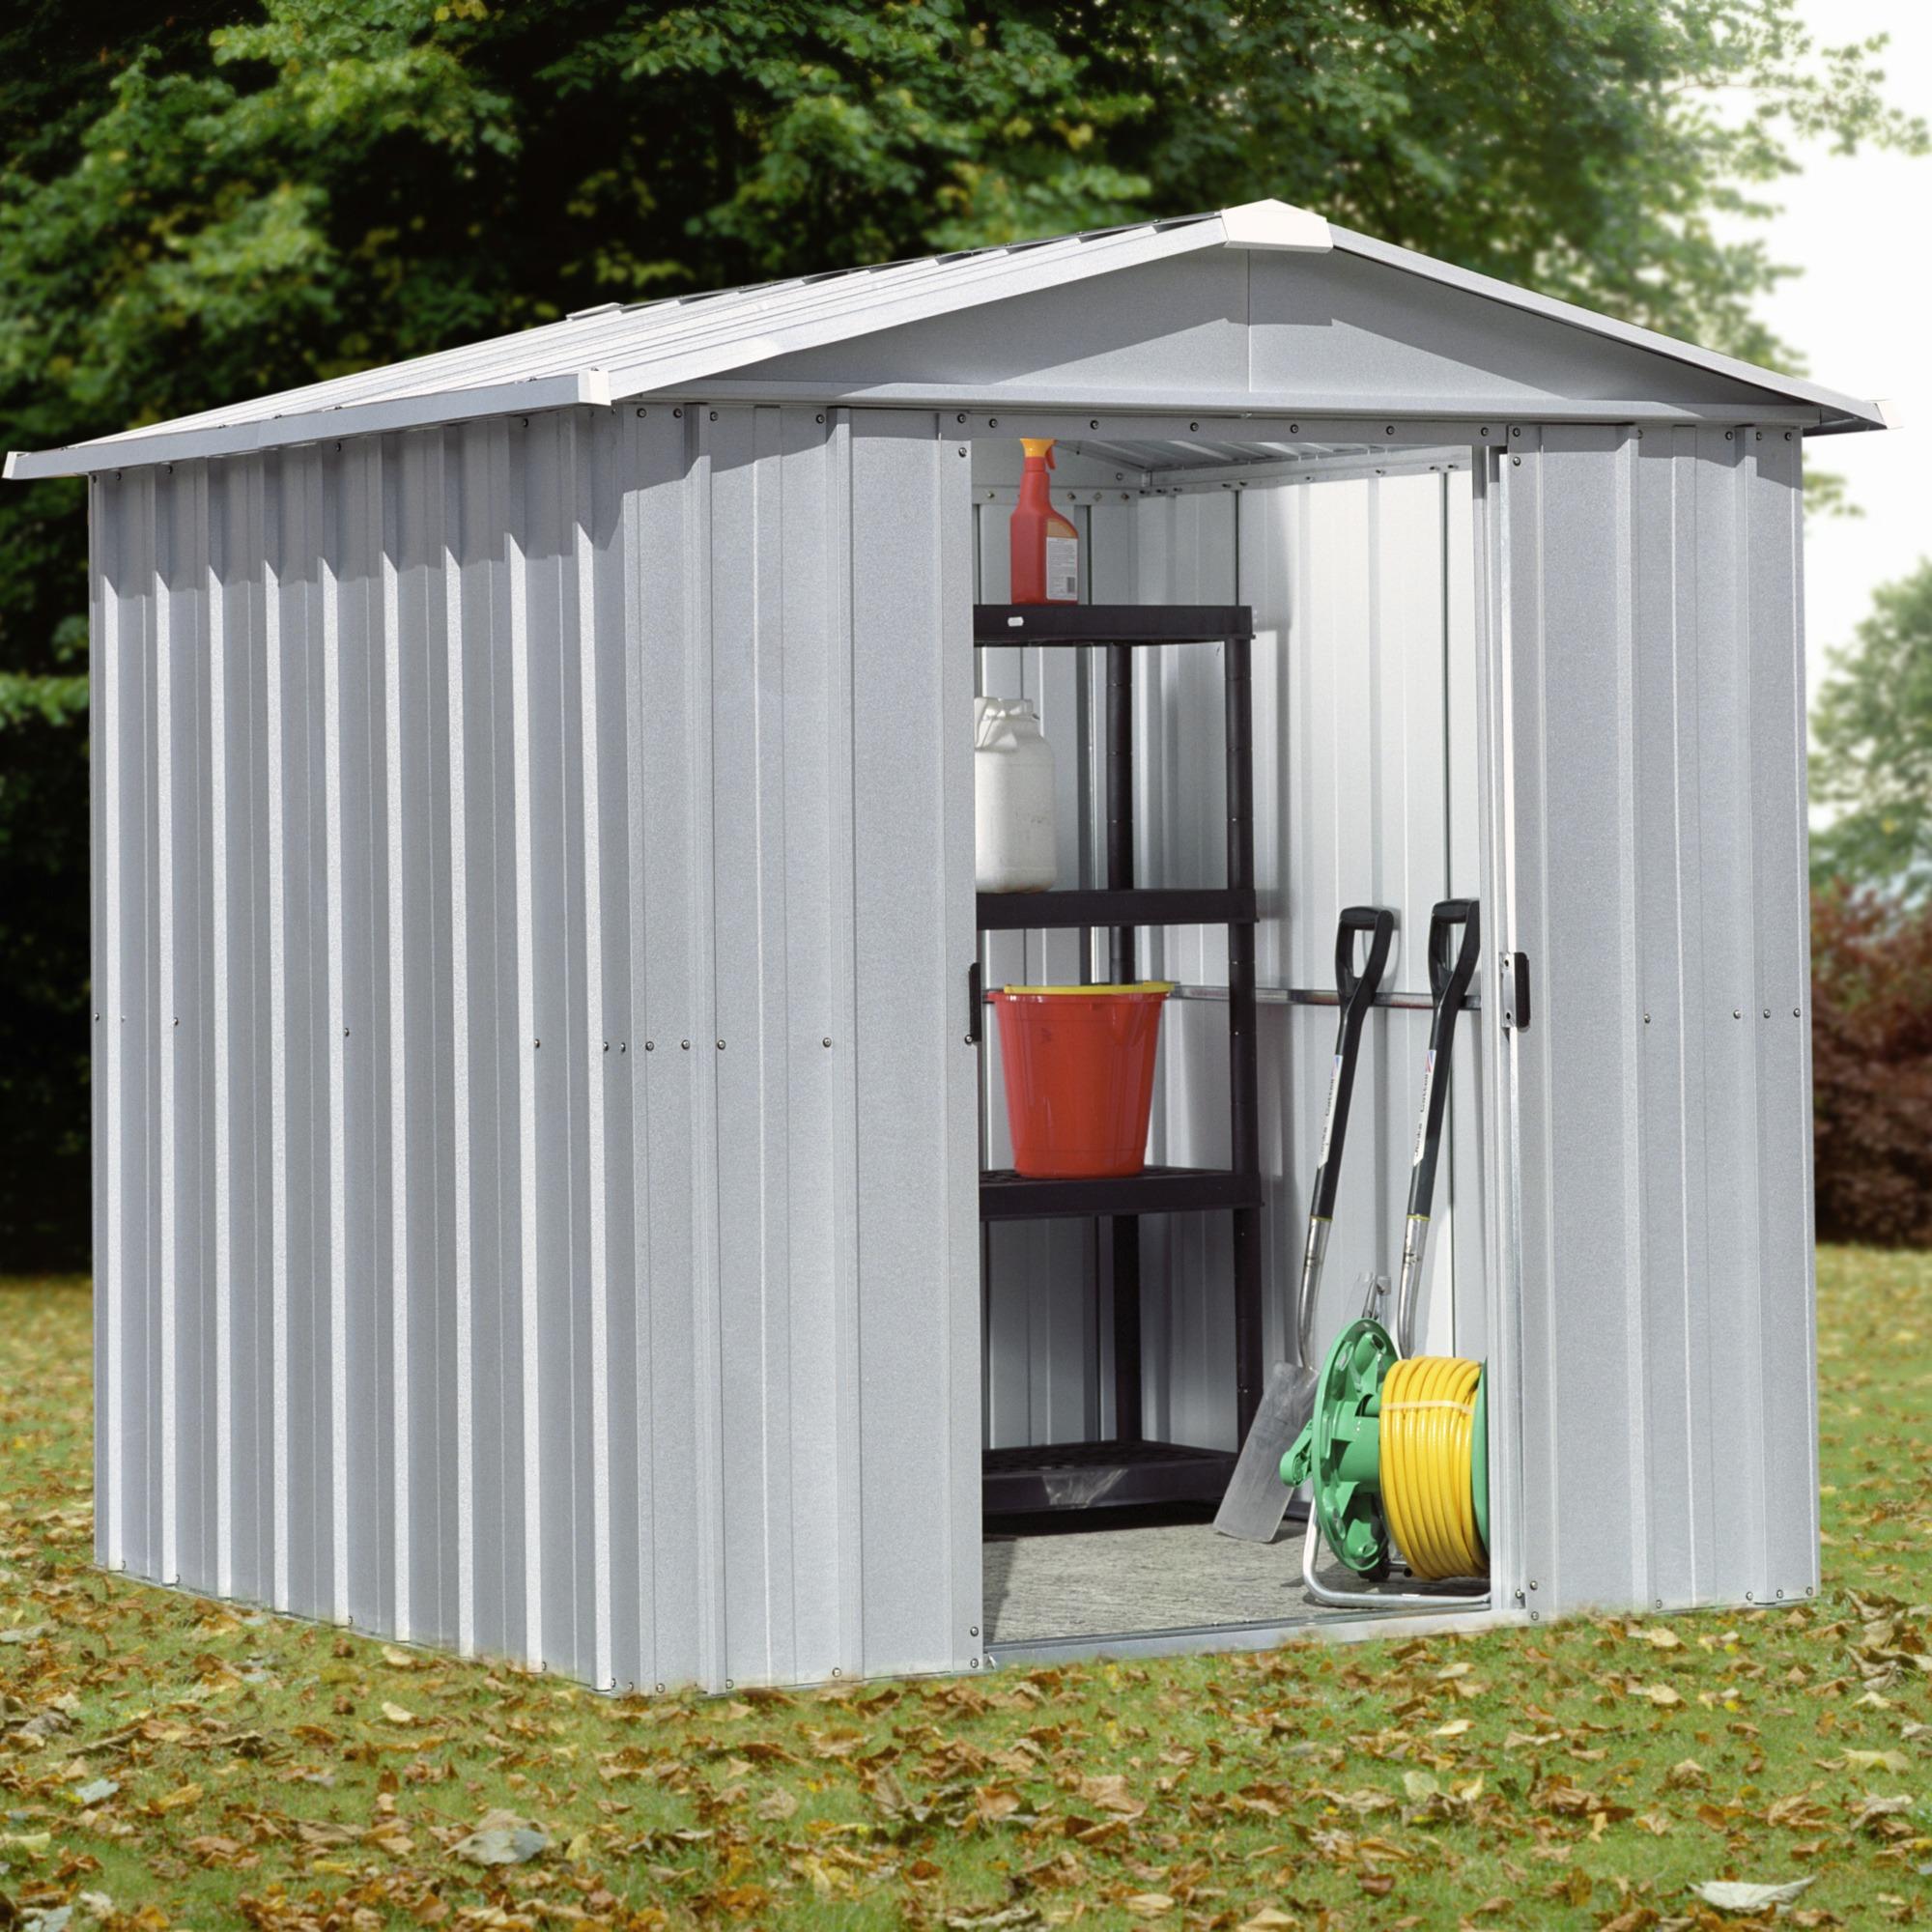 abri de jardin en acier galvanis deluxe apex 65 cabanes de jardin accessoires abris de. Black Bedroom Furniture Sets. Home Design Ideas